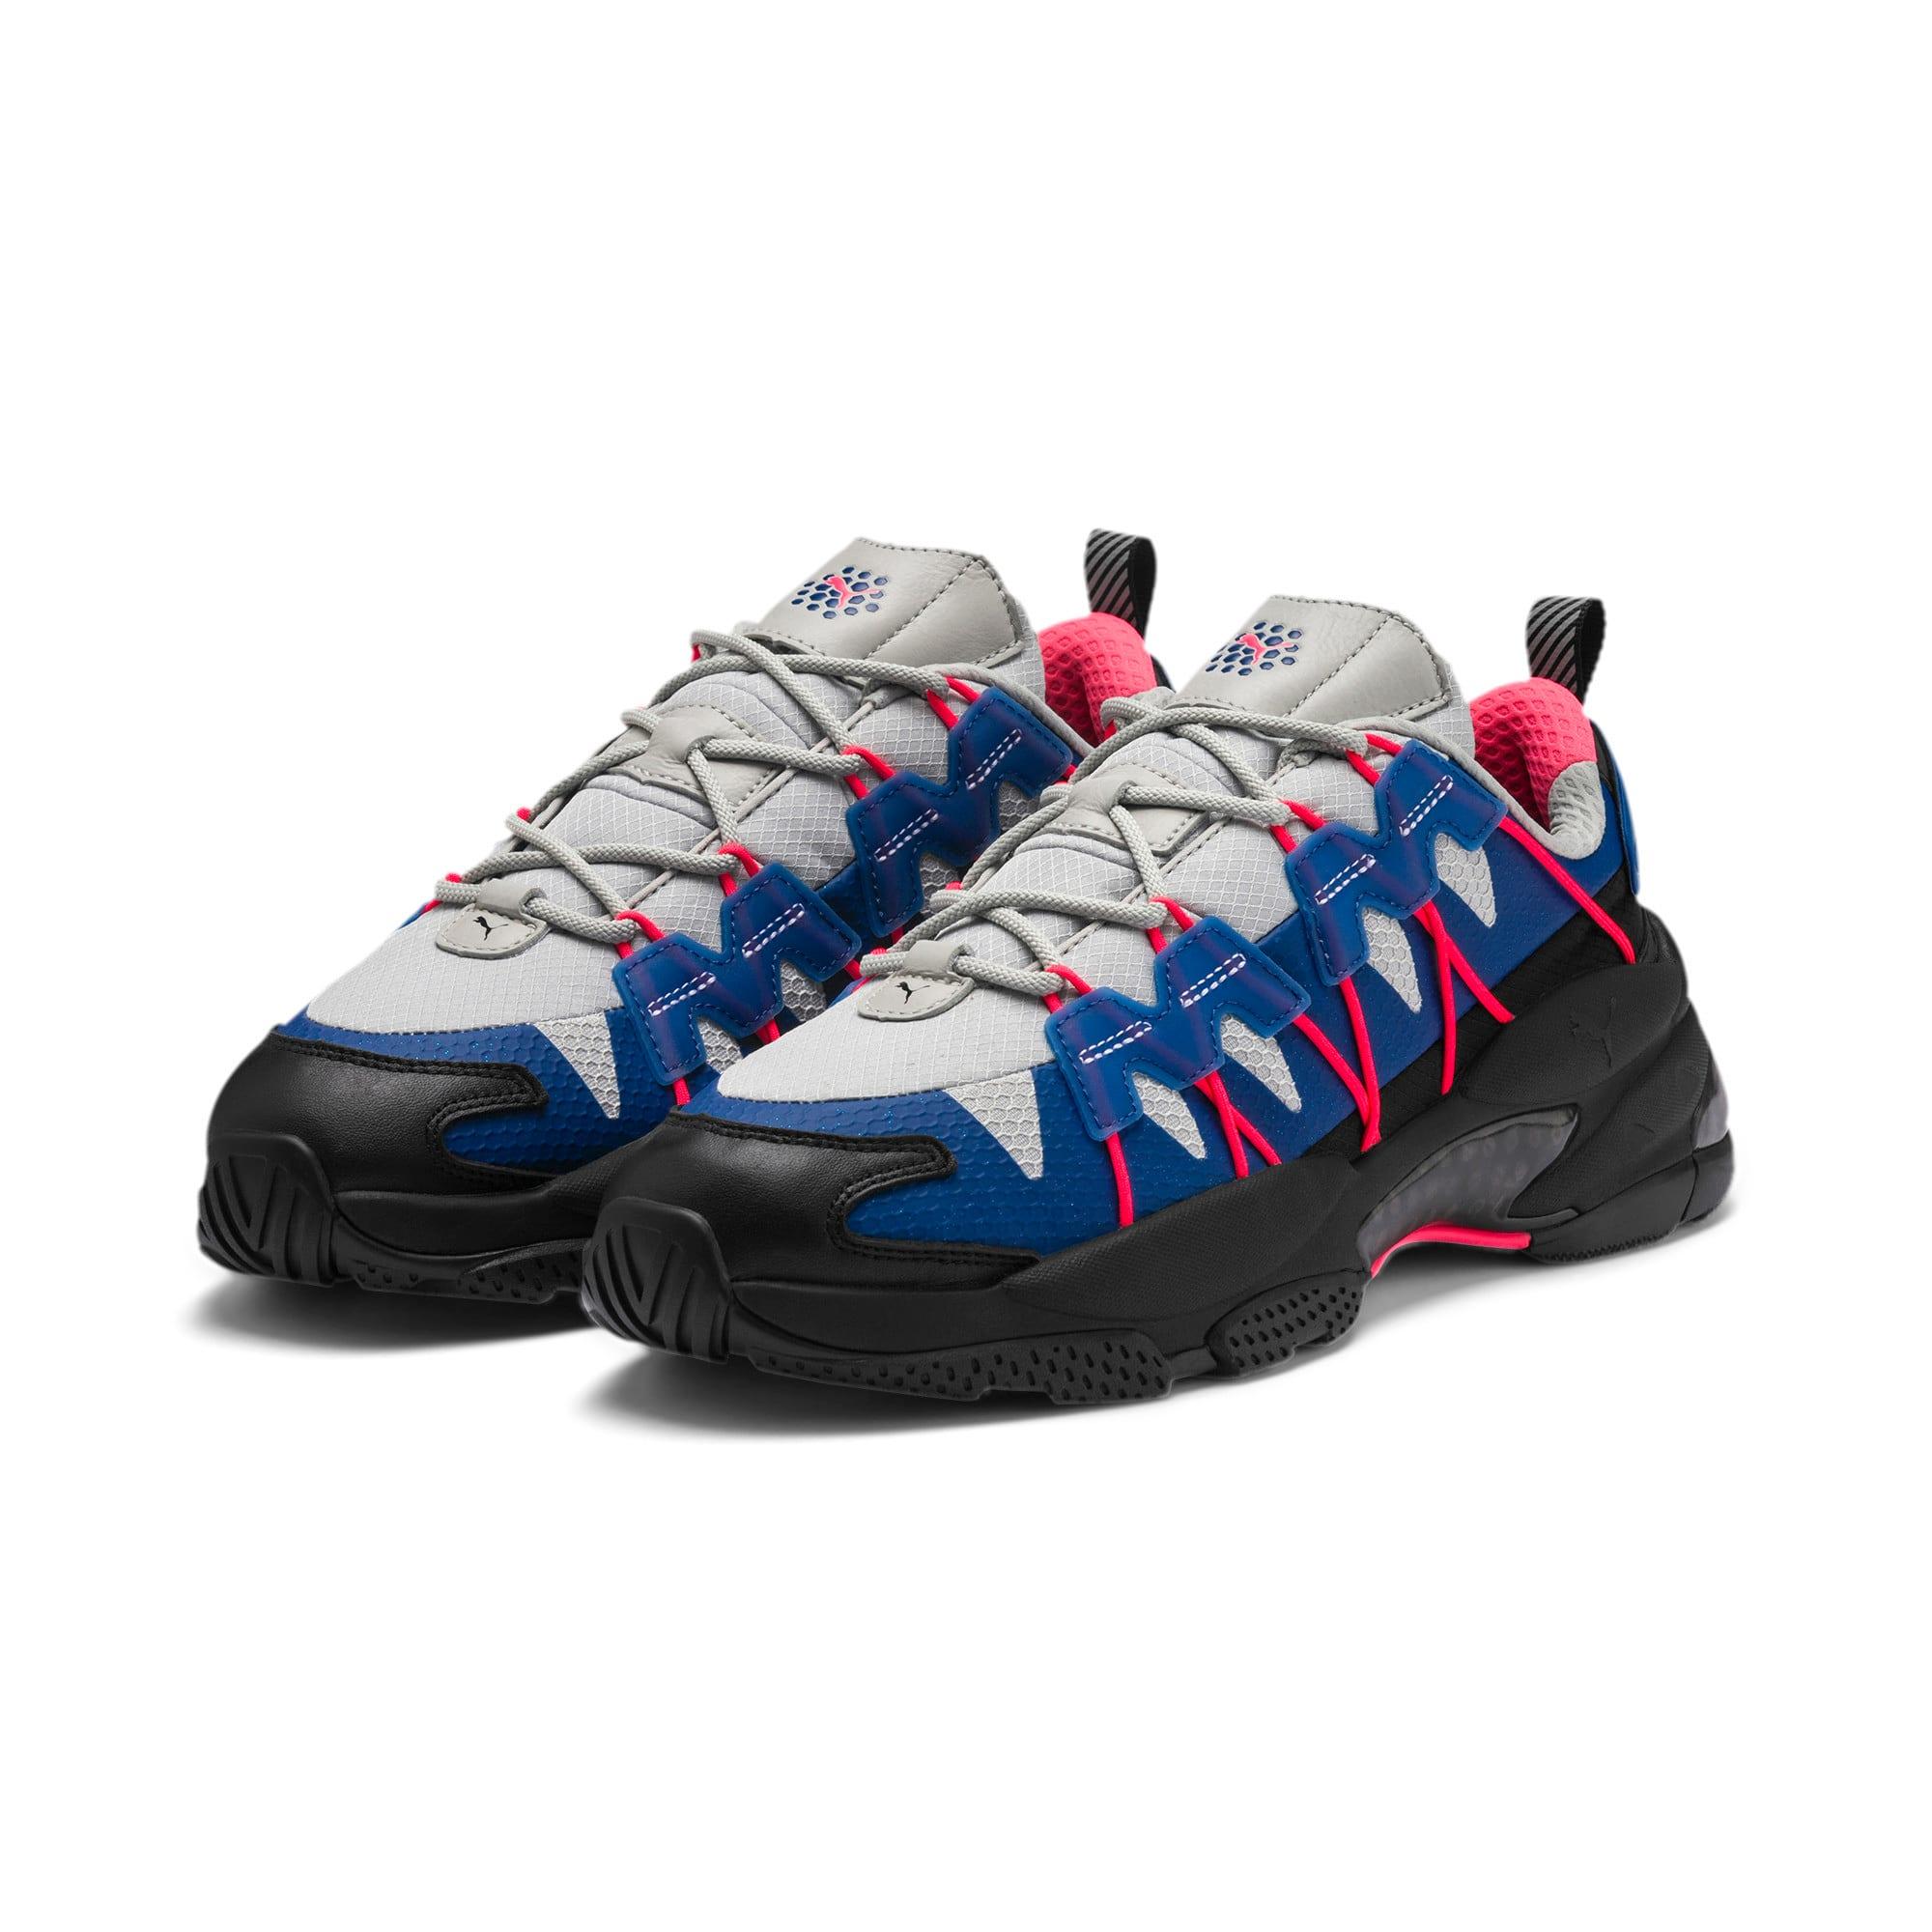 Thumbnail 2 of LQDCELL Omega Lab Sneaker, Puma Black-Galaxy Blue, medium